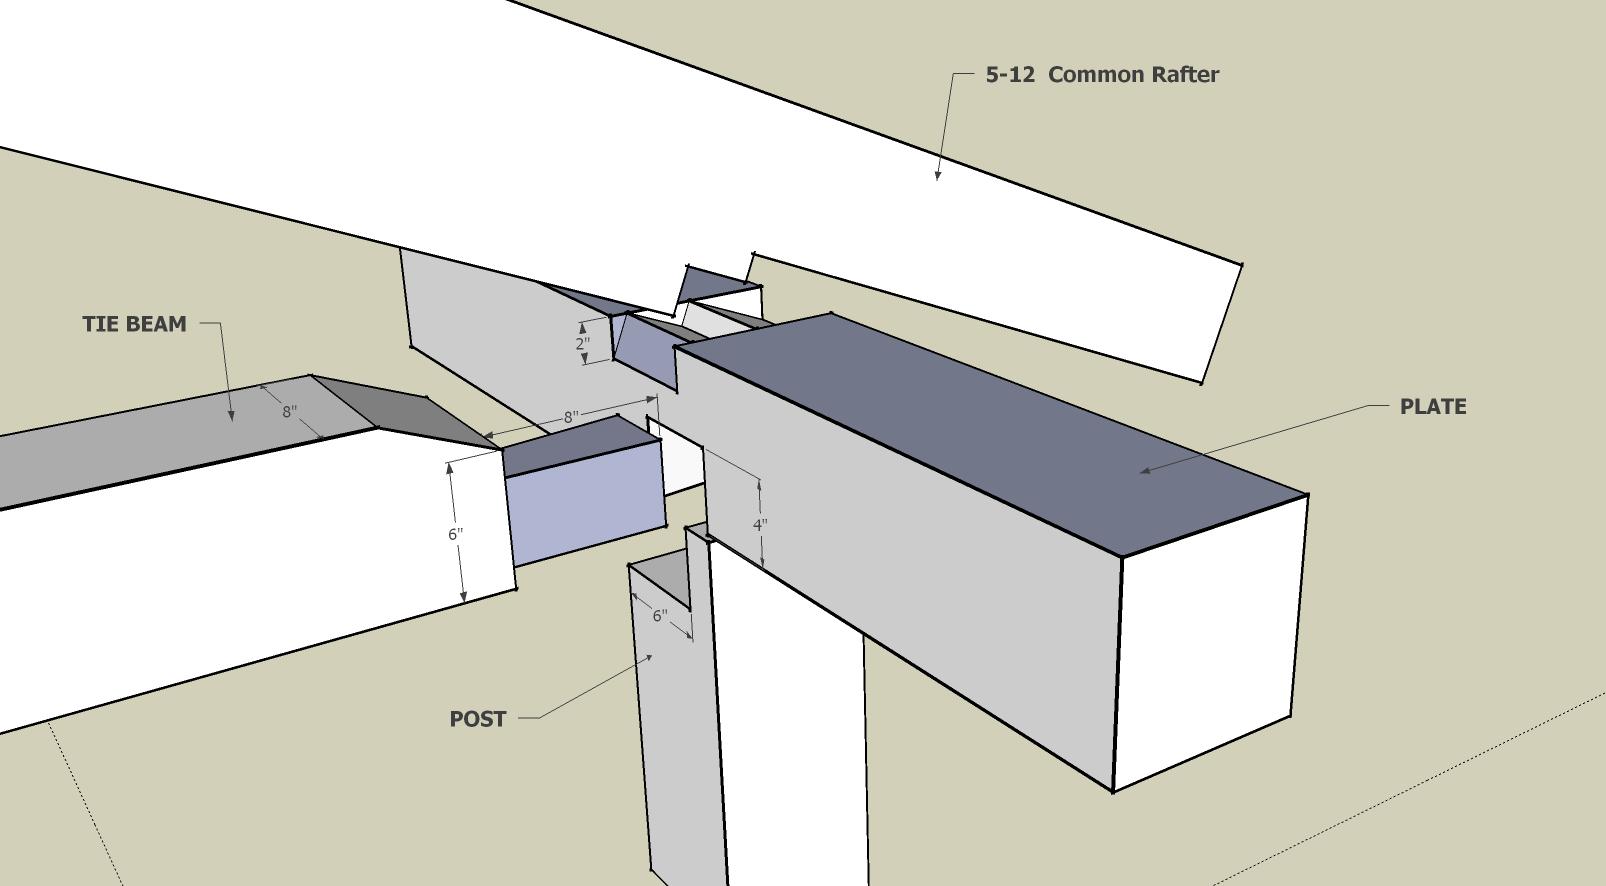 bond crete instructions joining concrete slabs